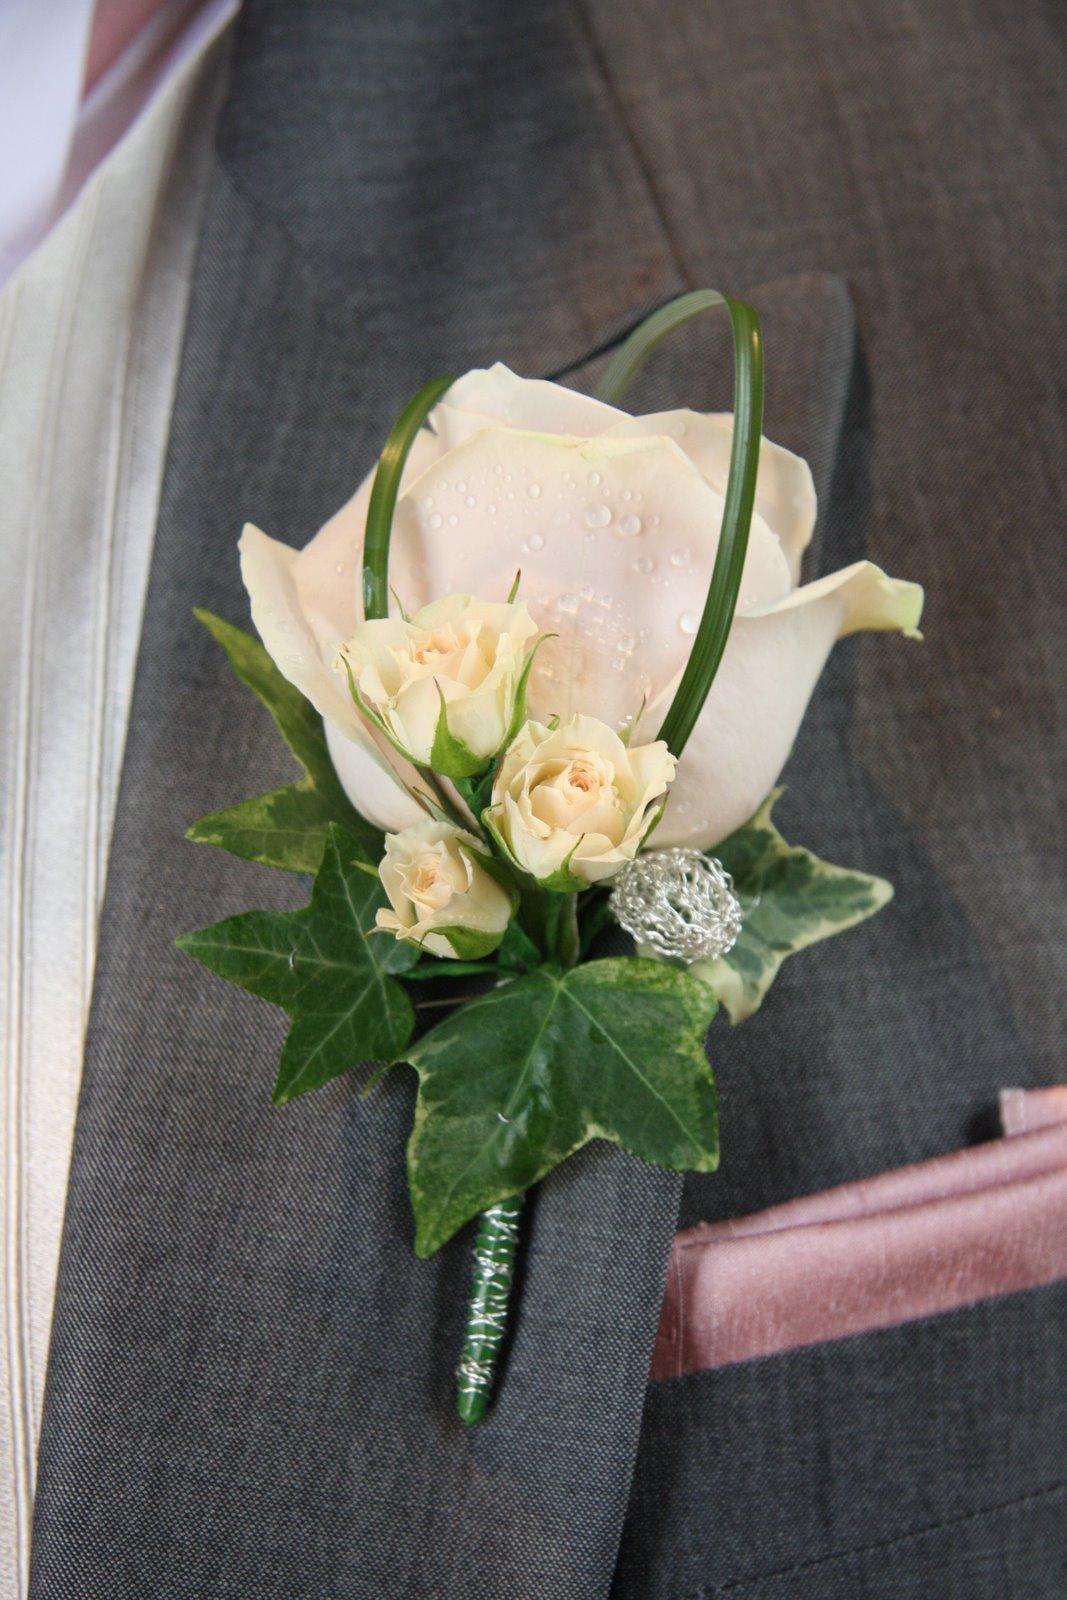 Flower Design Buttonhole & Corsage Blog Groom s Blush Pink Boutonniere